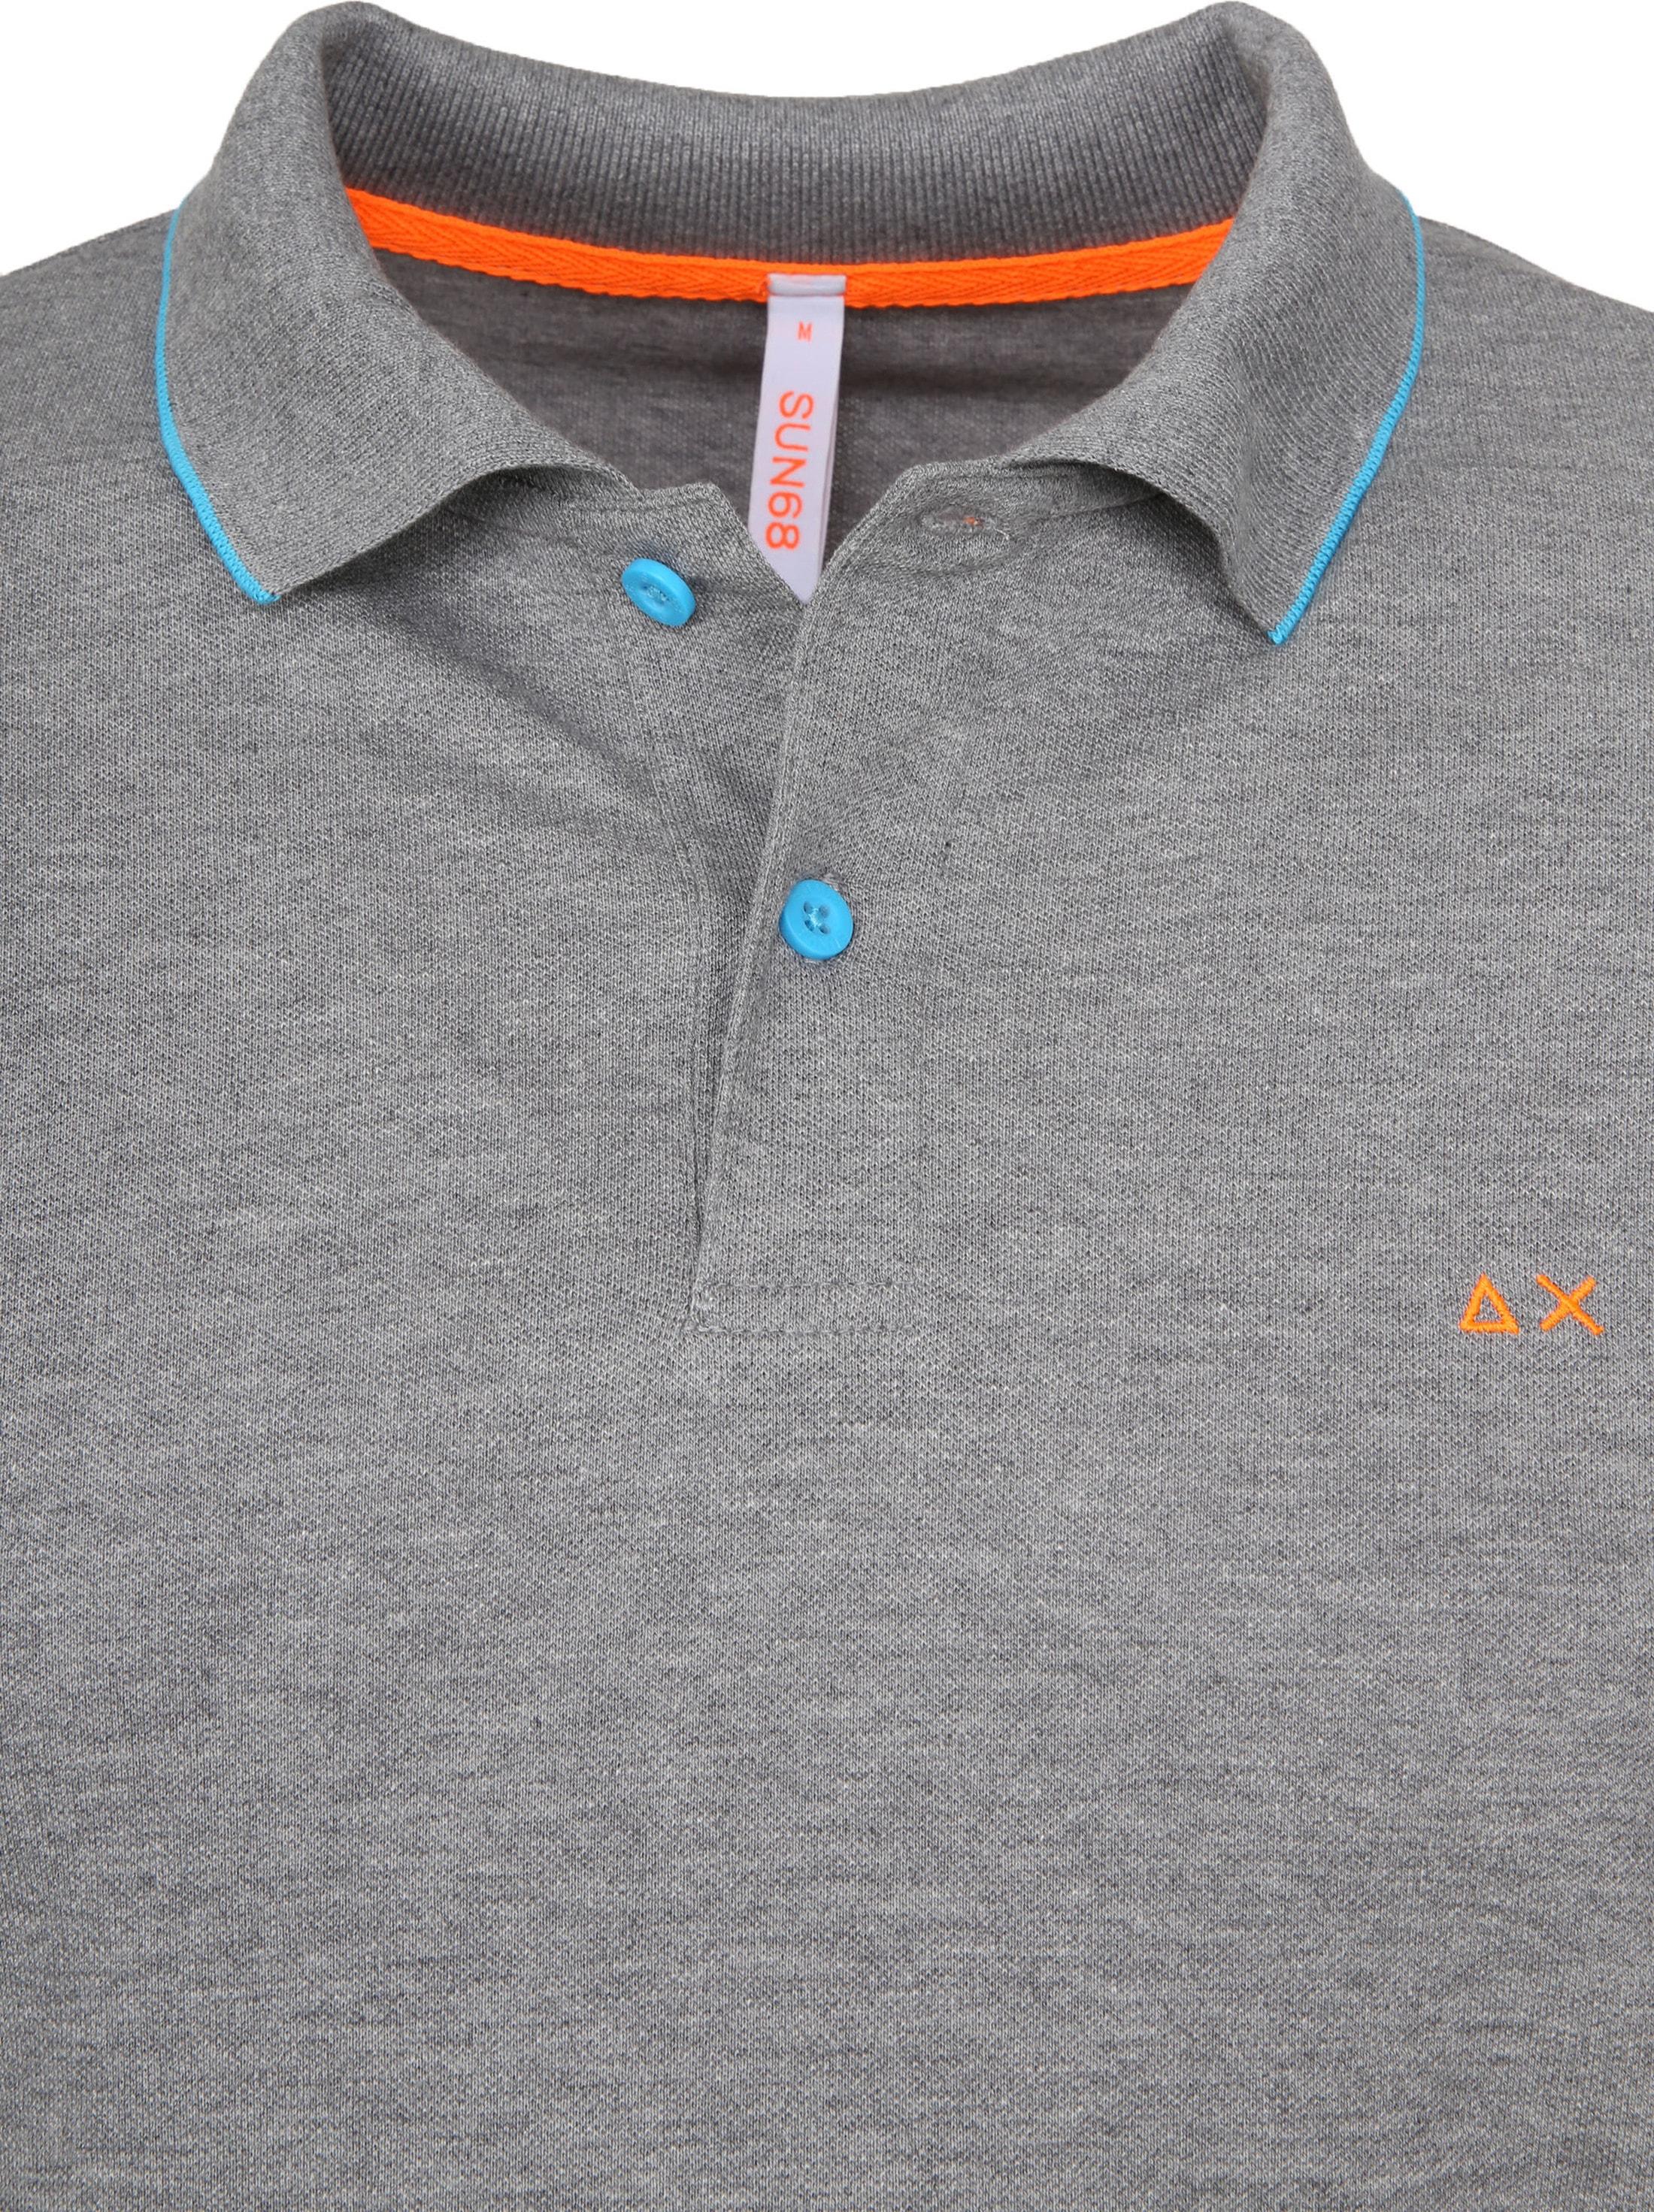 Sun68 Poloshirt Small Stripes Fluo Grau foto 1